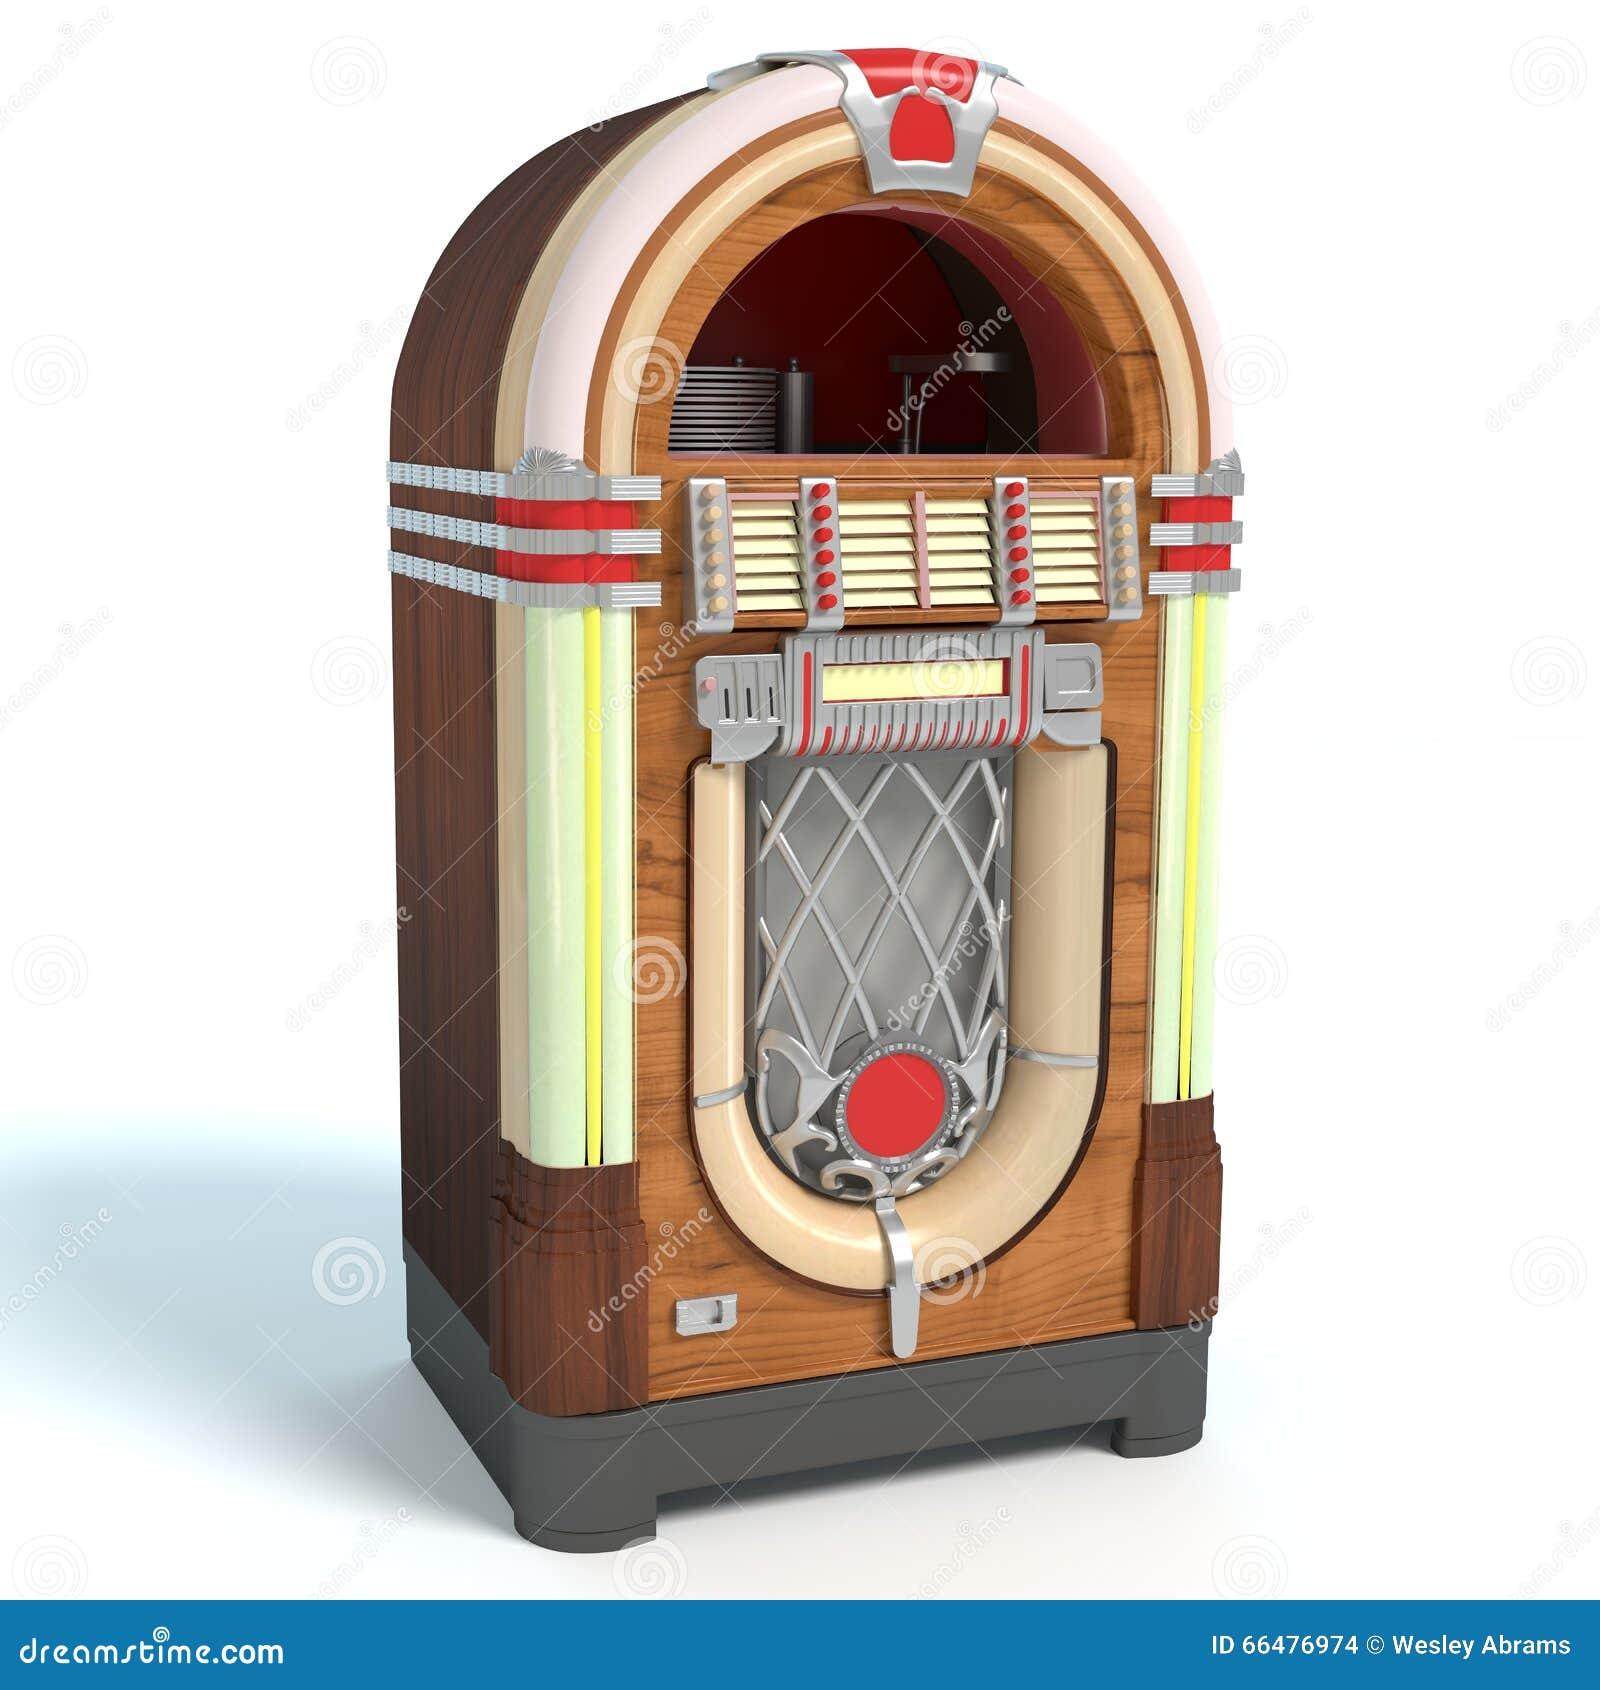 Line Art Jukebox : Juke cartoons illustrations vector stock images